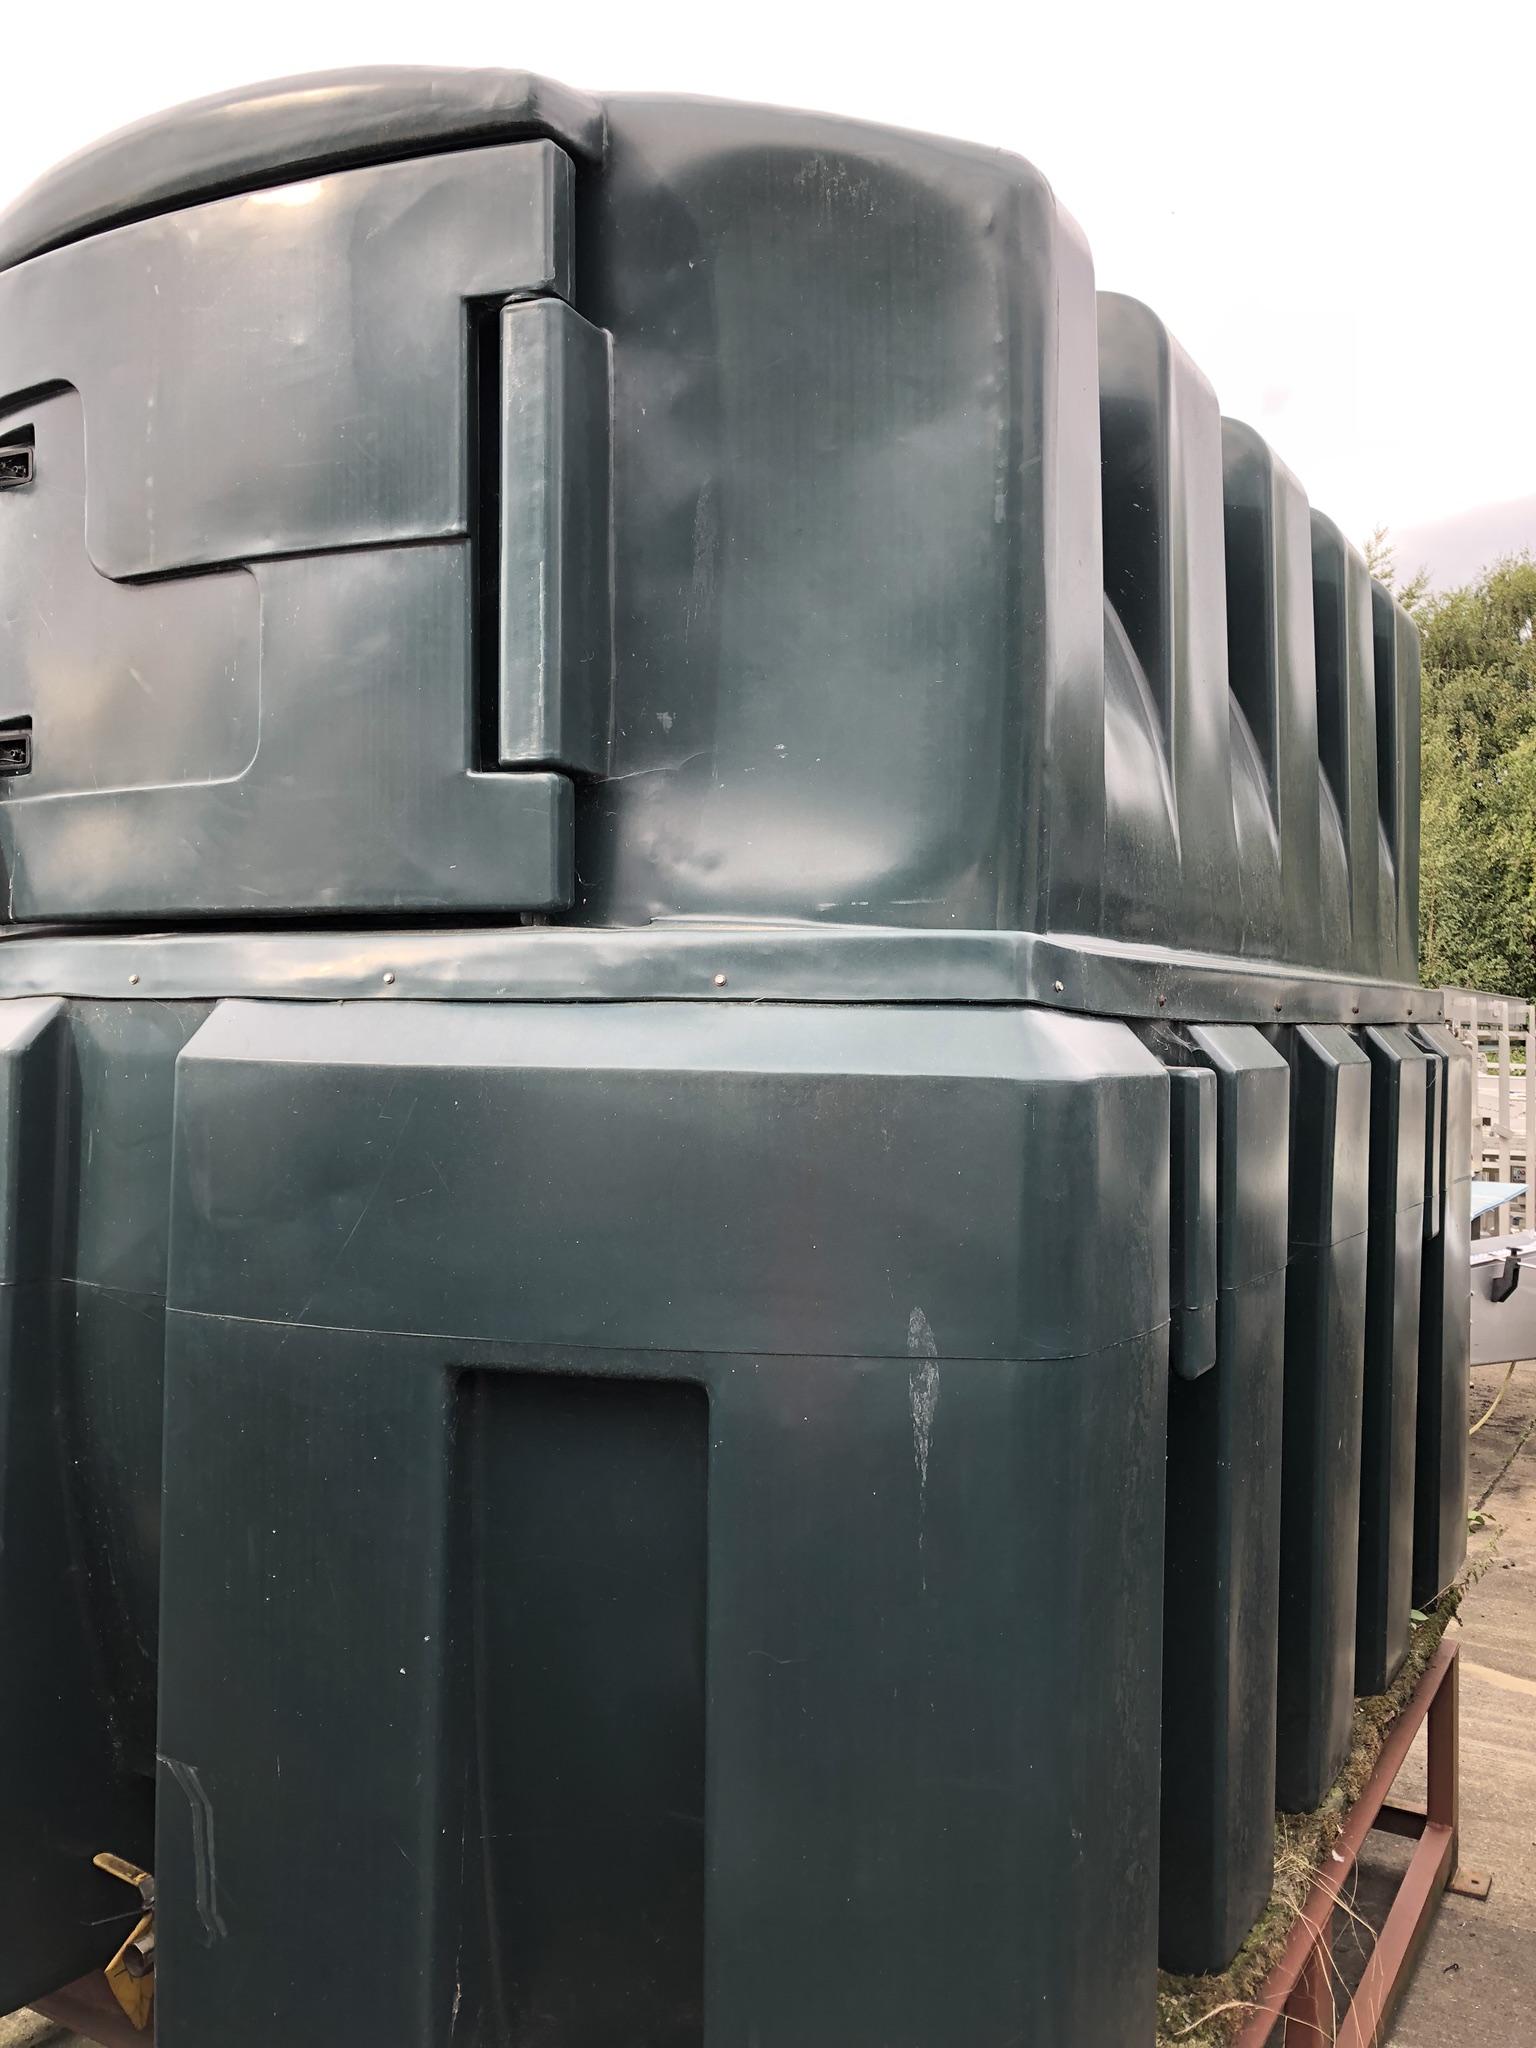 Titan ES500B 5000L Diesel Tank, lift out charge - £100